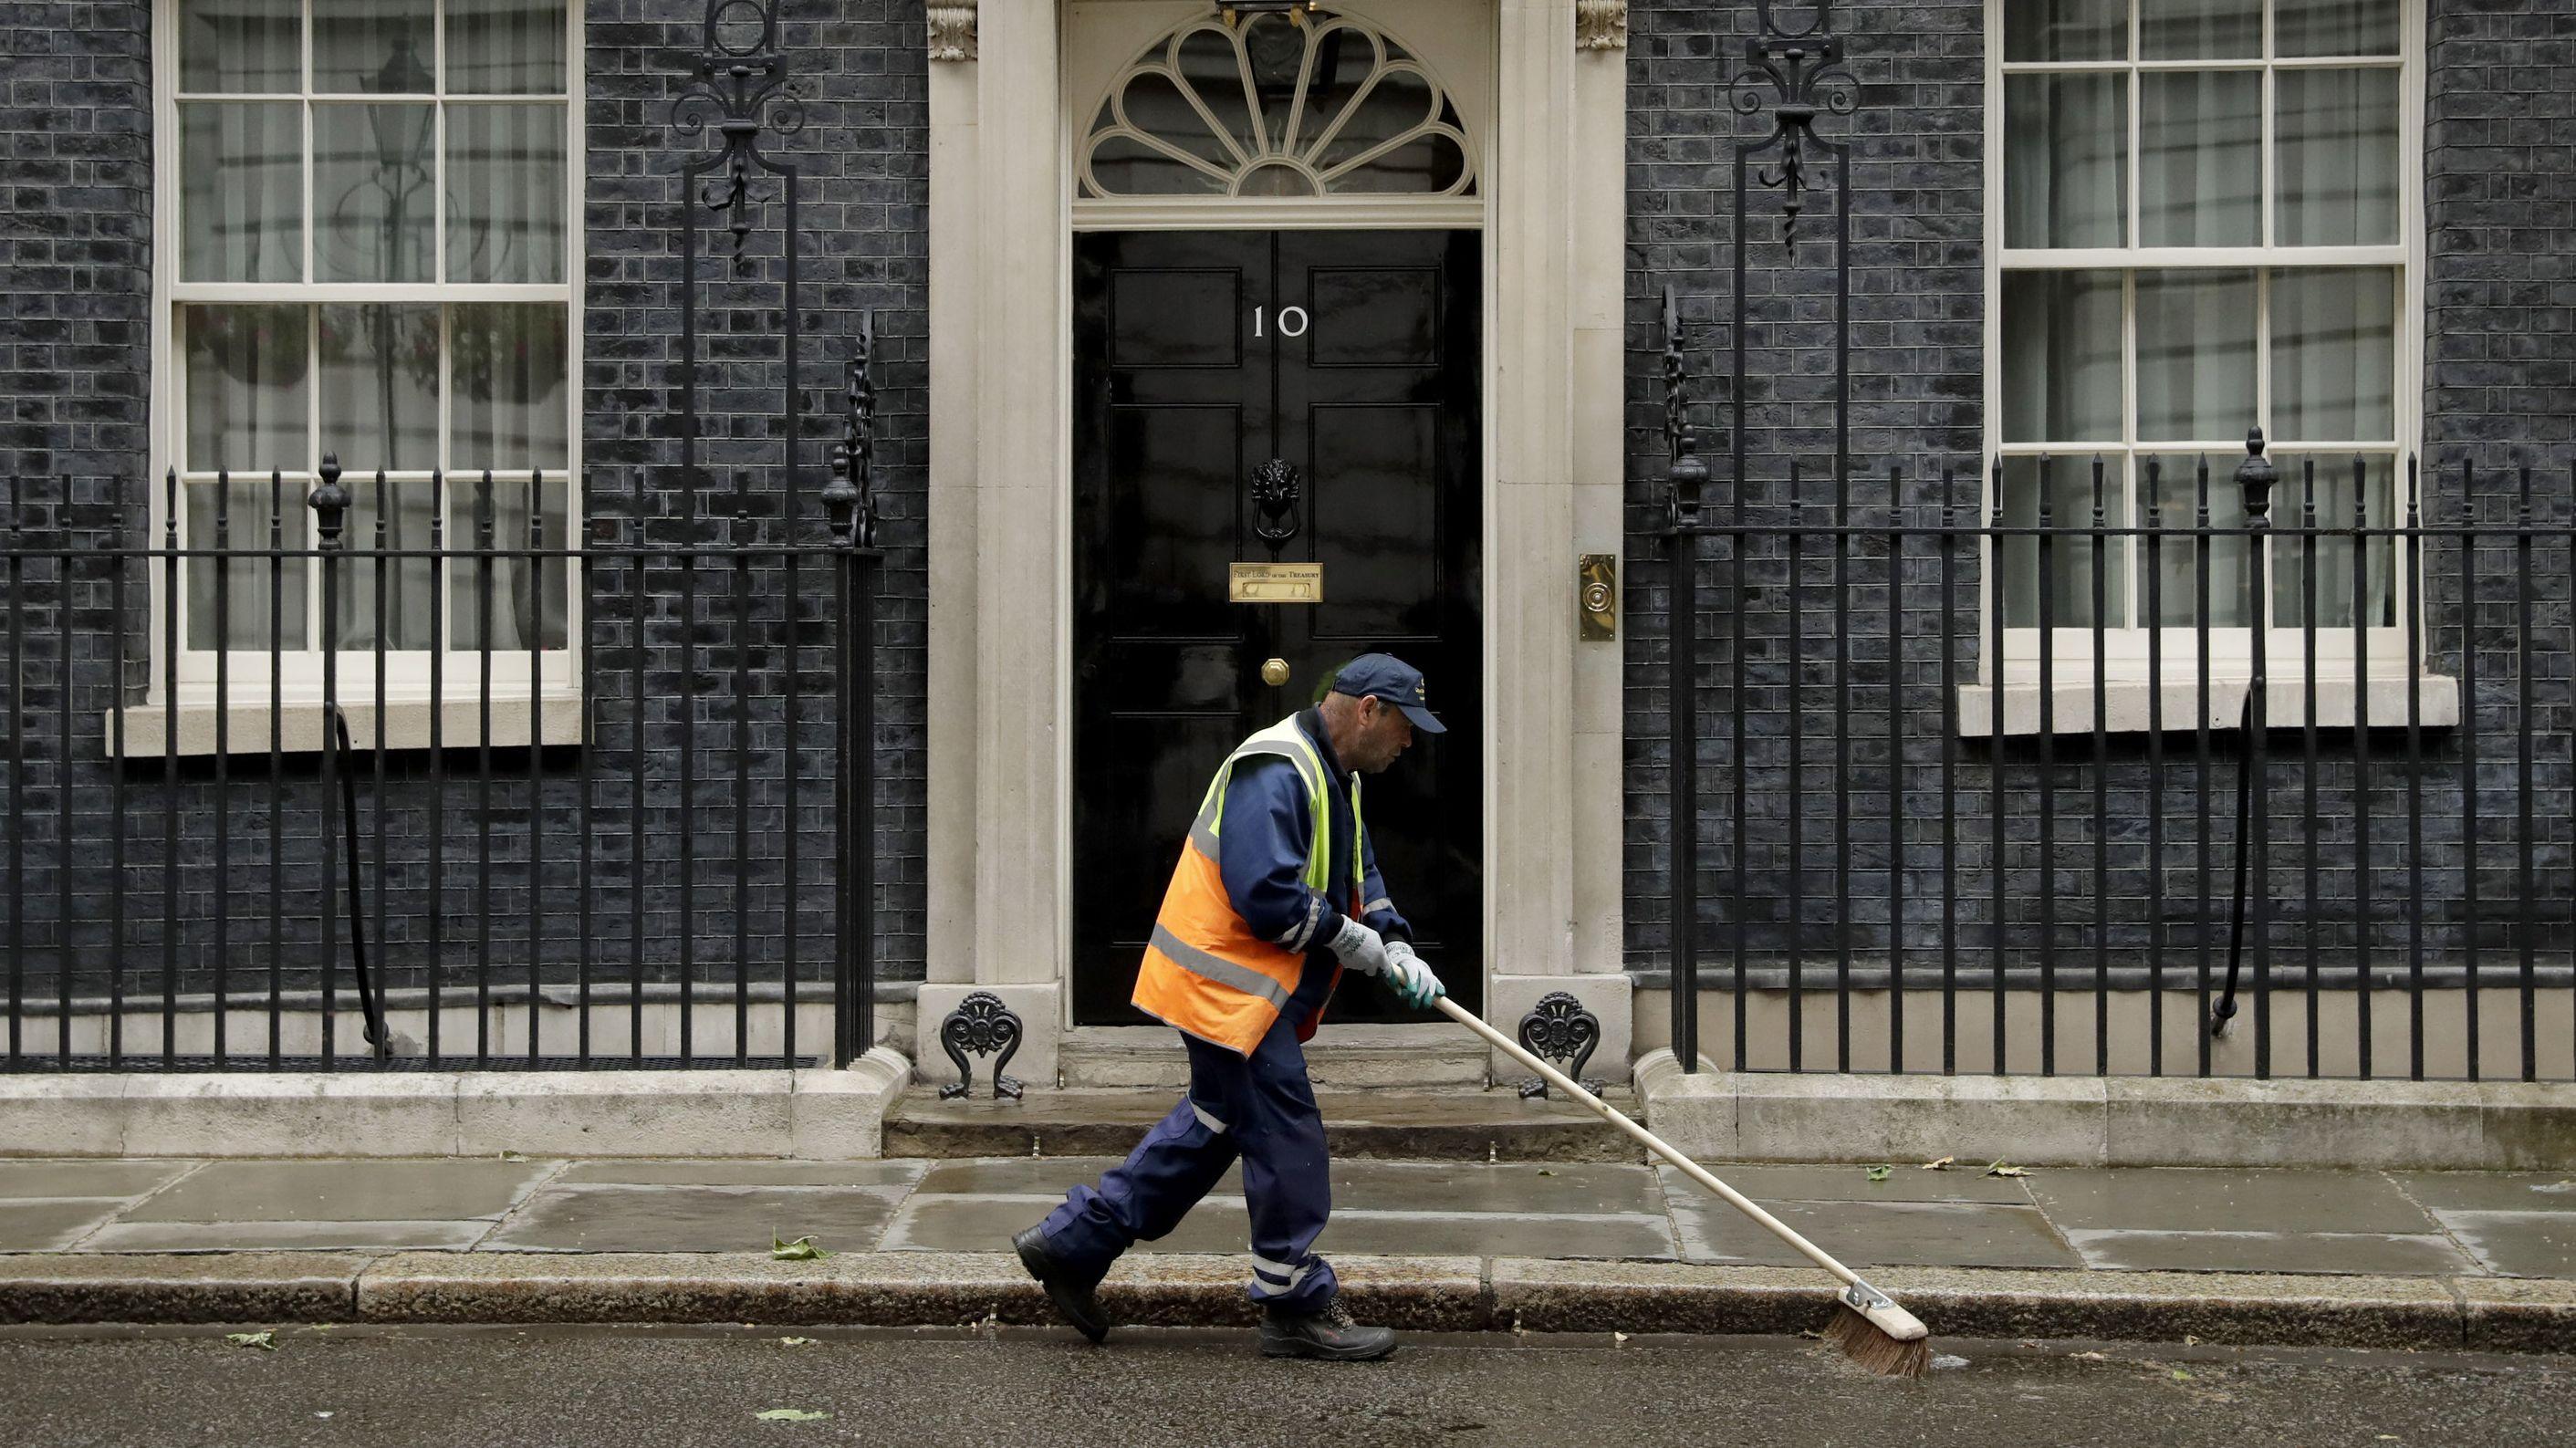 Straßenfeger vor Downing Street 10 in London